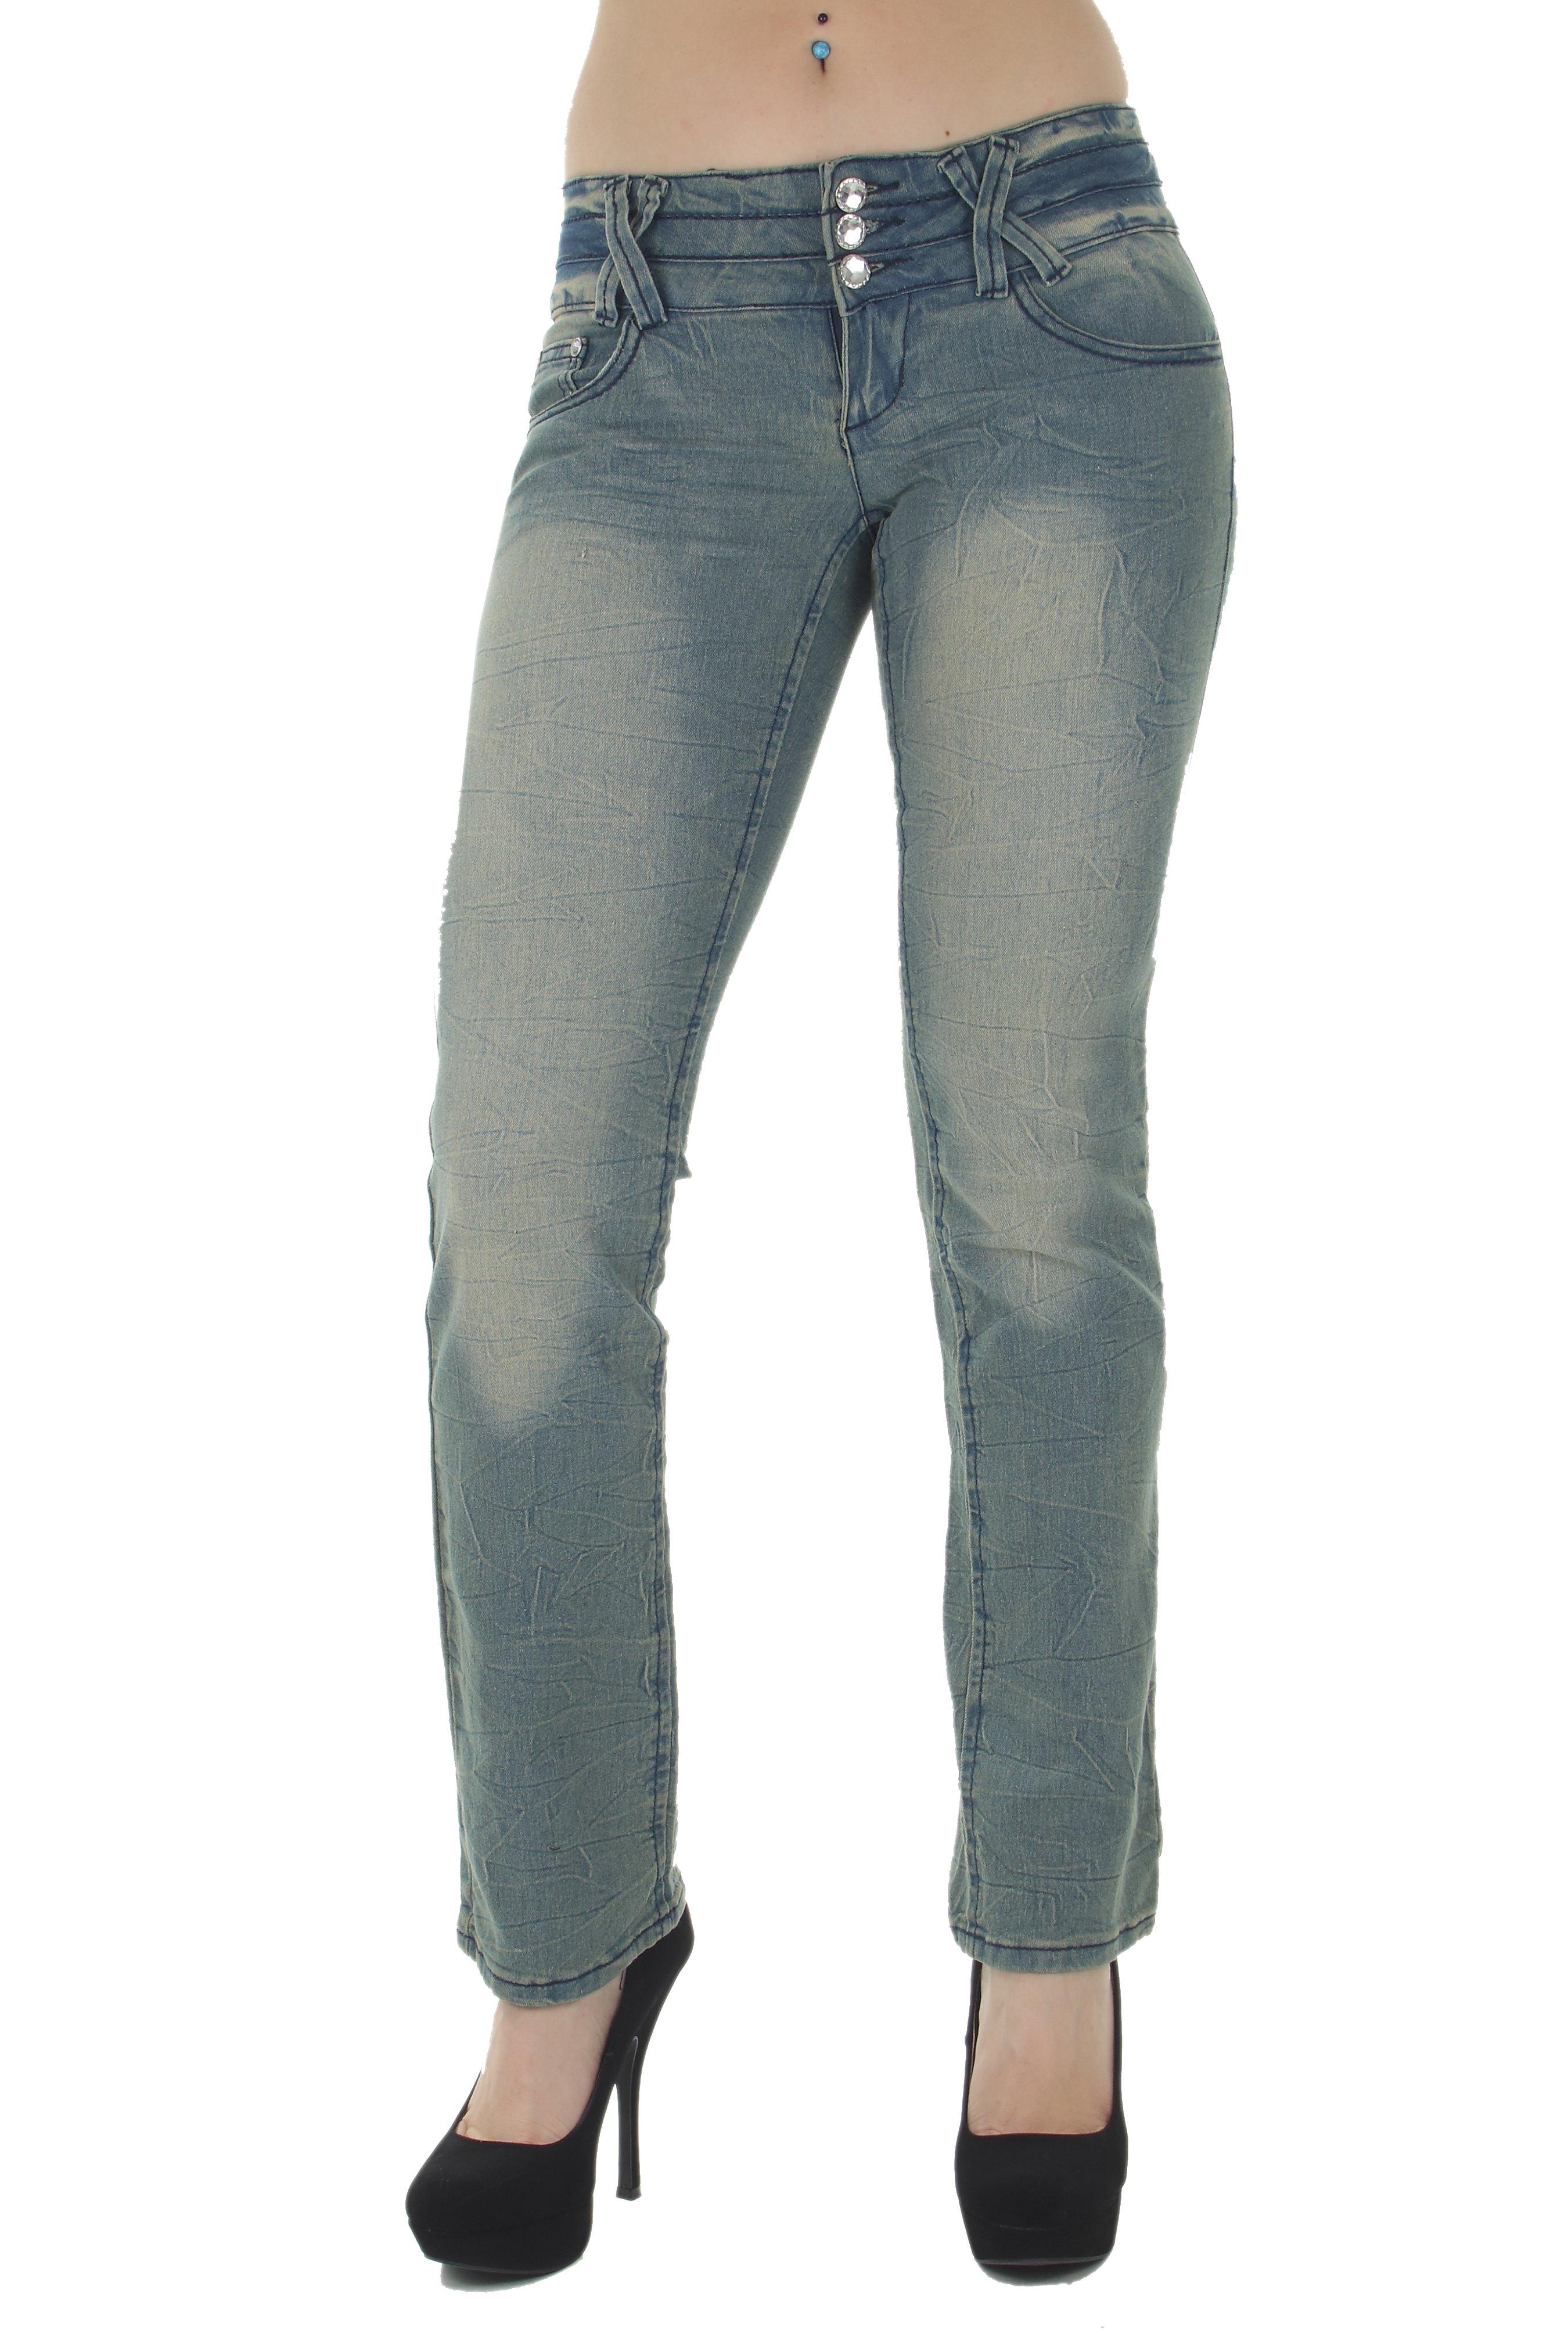 Colombian Design Boot Leg Jeans Levanta Cola Low Waist Butt Lift